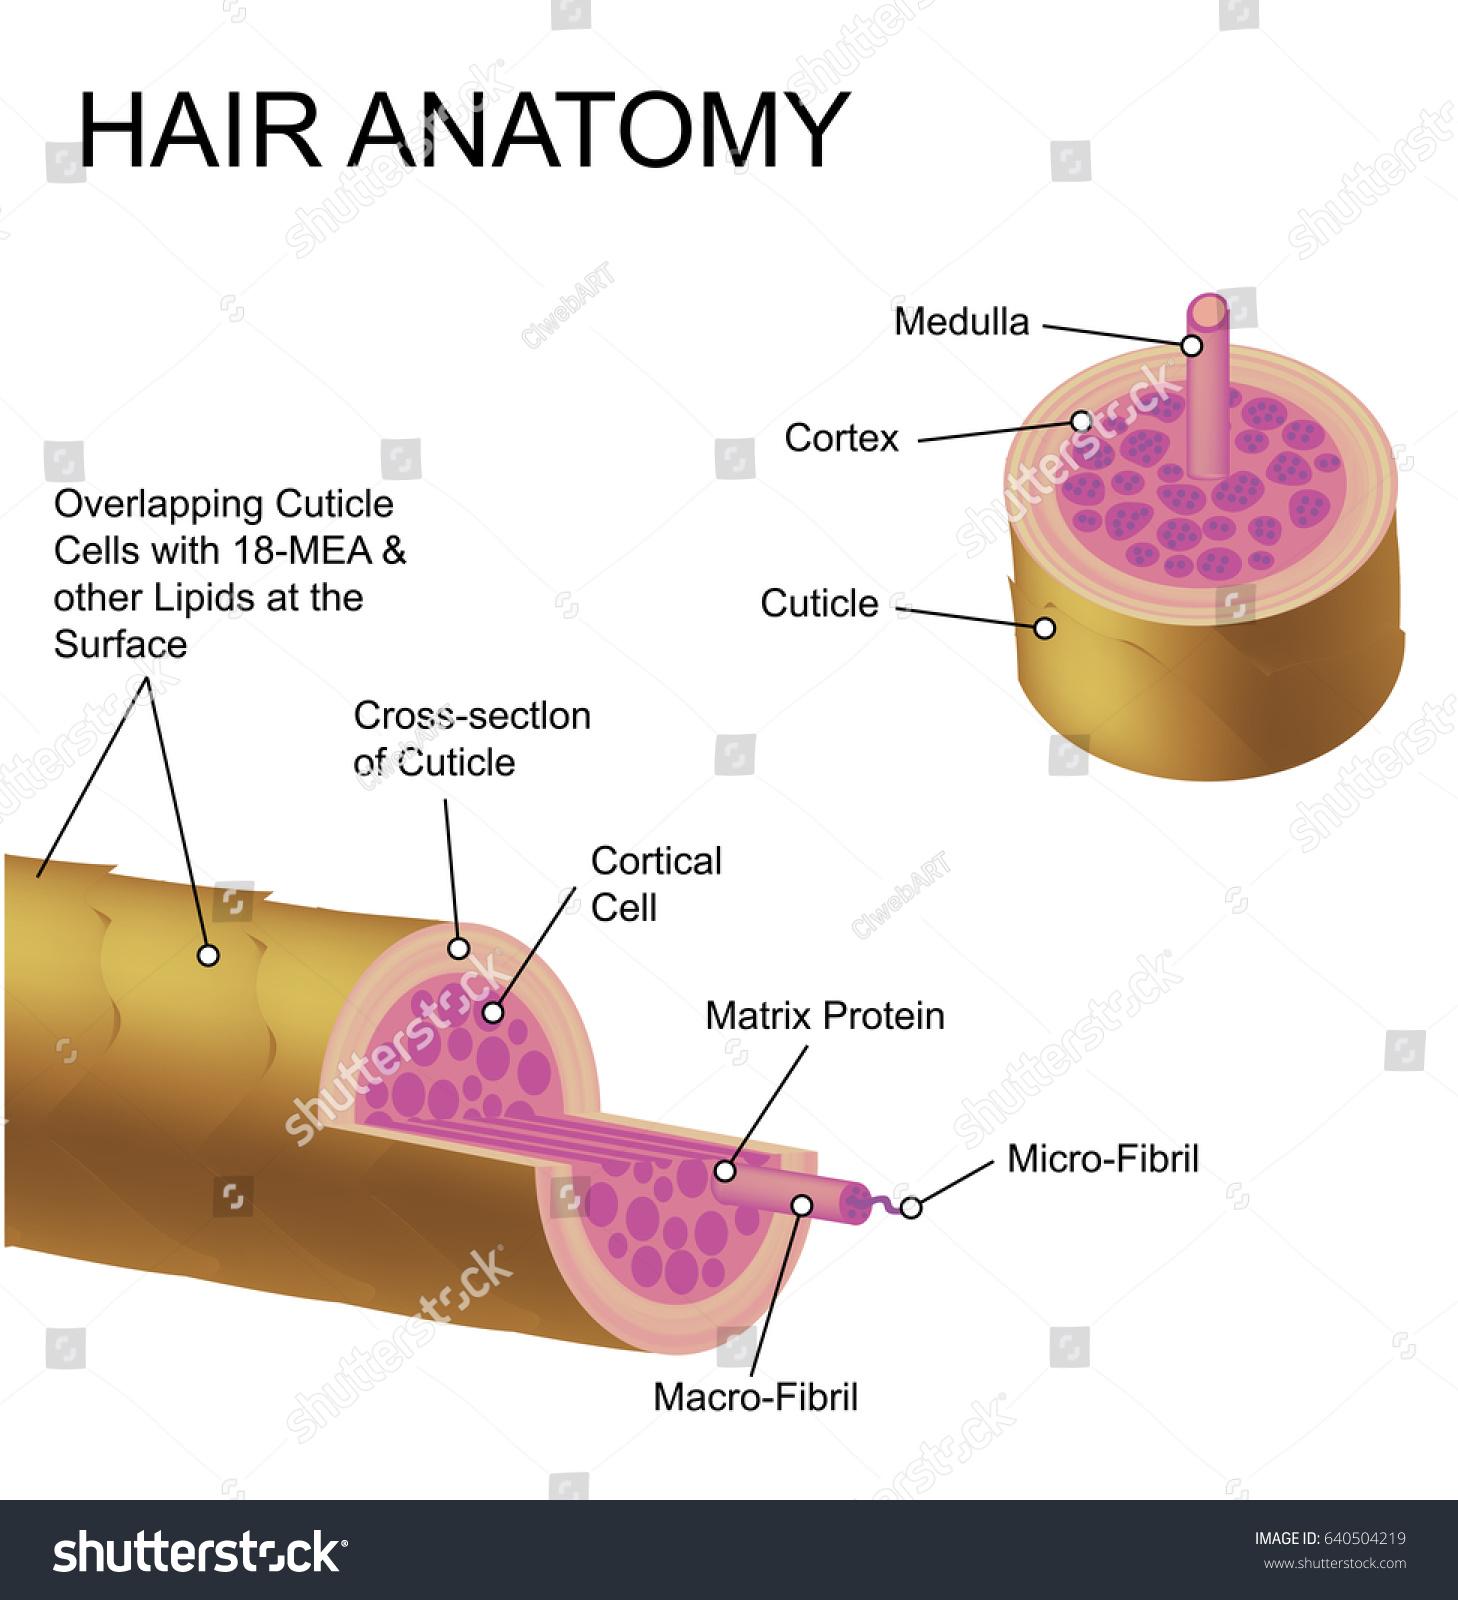 Hair Anatomy Stock Vector 640504219 - Shutterstock